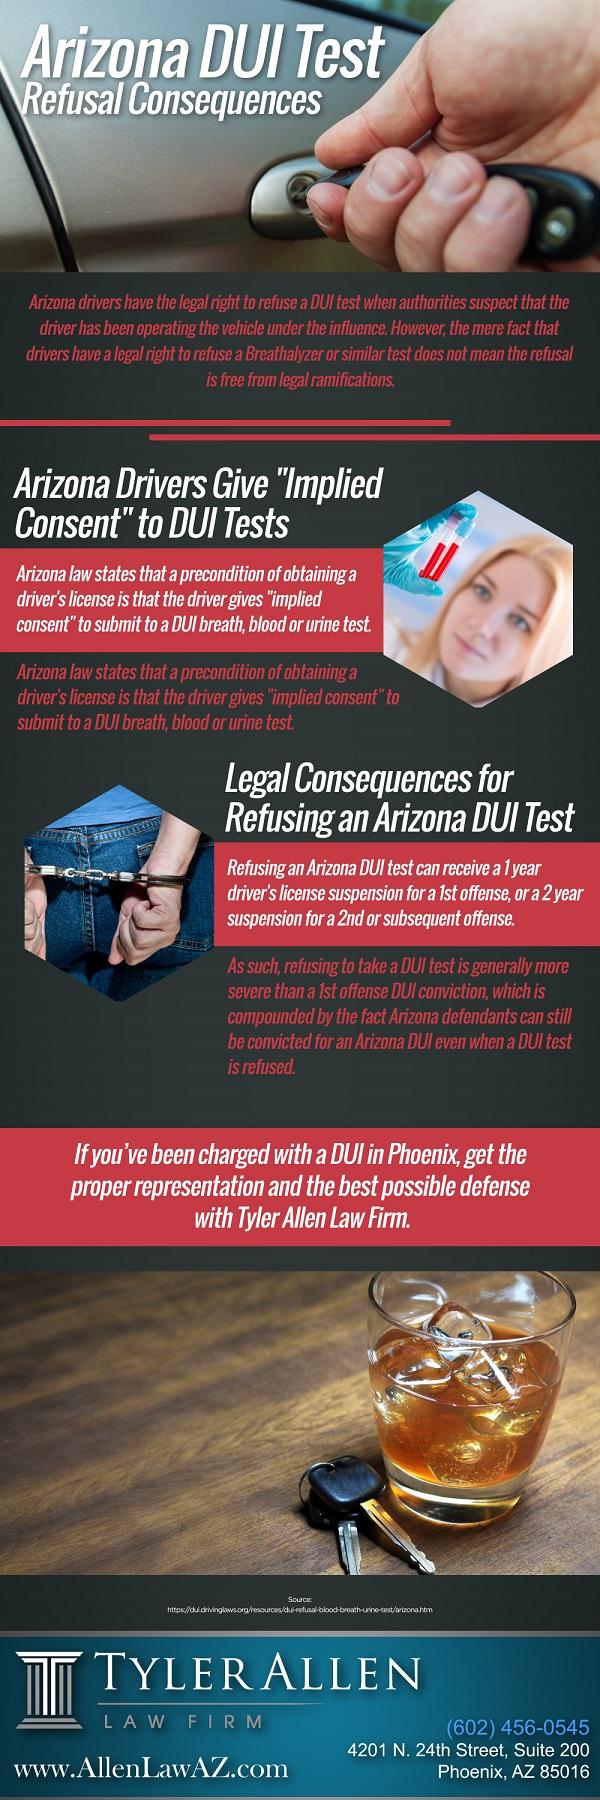 Copy of AZ-DUI-Test-Refusal-Consequences.jpg